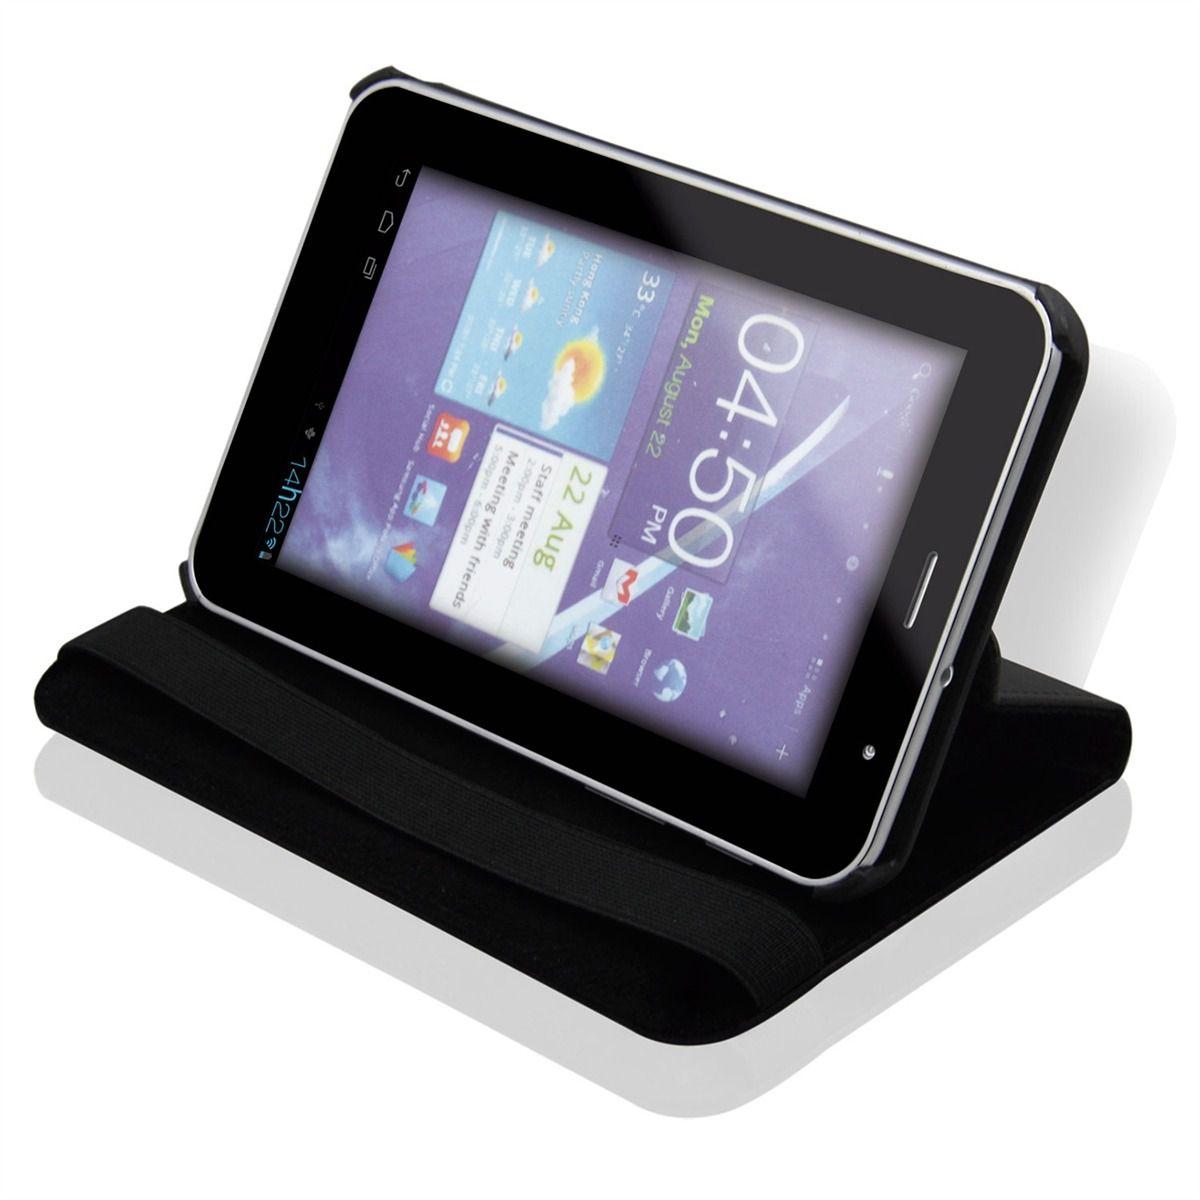 Case E Suporte Giratória Para Samsung Galaxy 7Pol Preto Multilaser BO189  - Mix Eletro